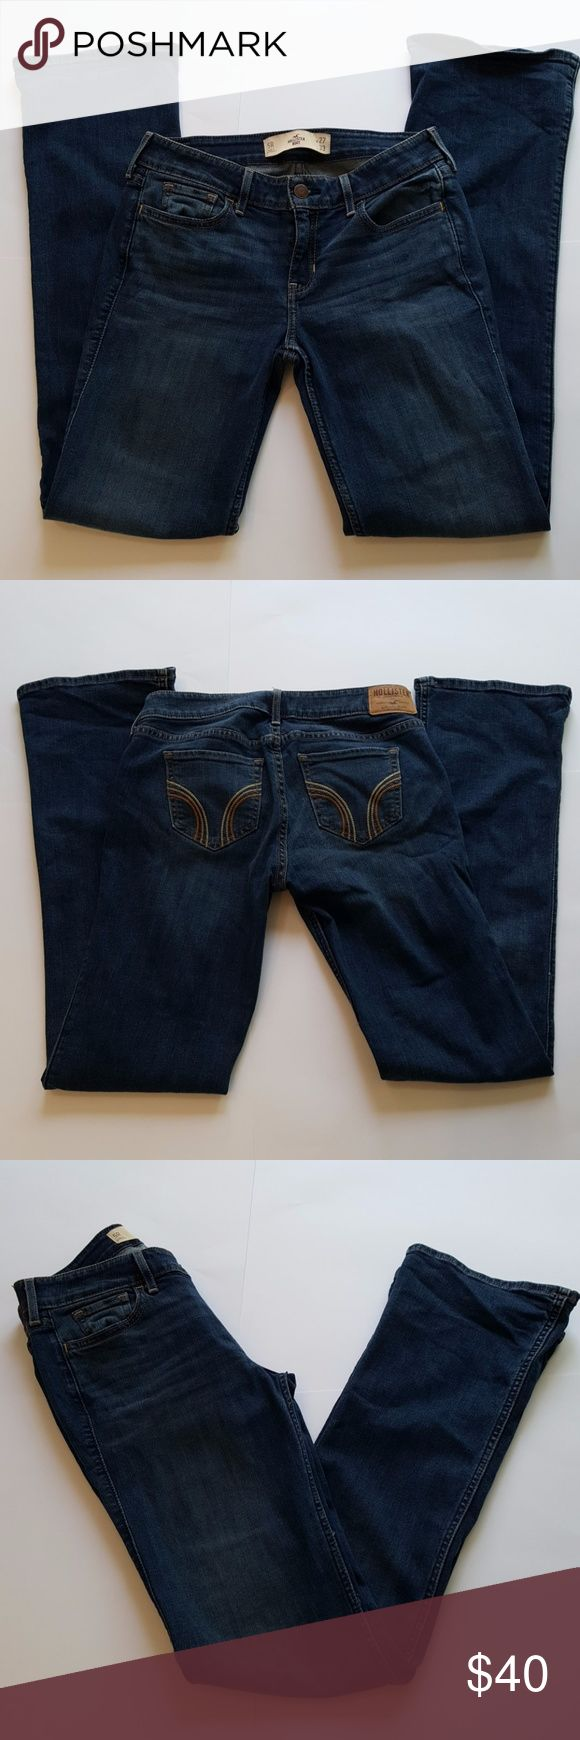 NWOT Hollister Women's Bootcut Jeans Size 27 NWOT Hollister Women's Bootcut Jeans Size 27 Colour Medium Blue Rinse Measurements: Waist 14 Inchs Inseam 31 Inchs Length 39 Inchs Rise 8 Inchs Cuffs 8 Inchs Hollister Jeans Boot Cut